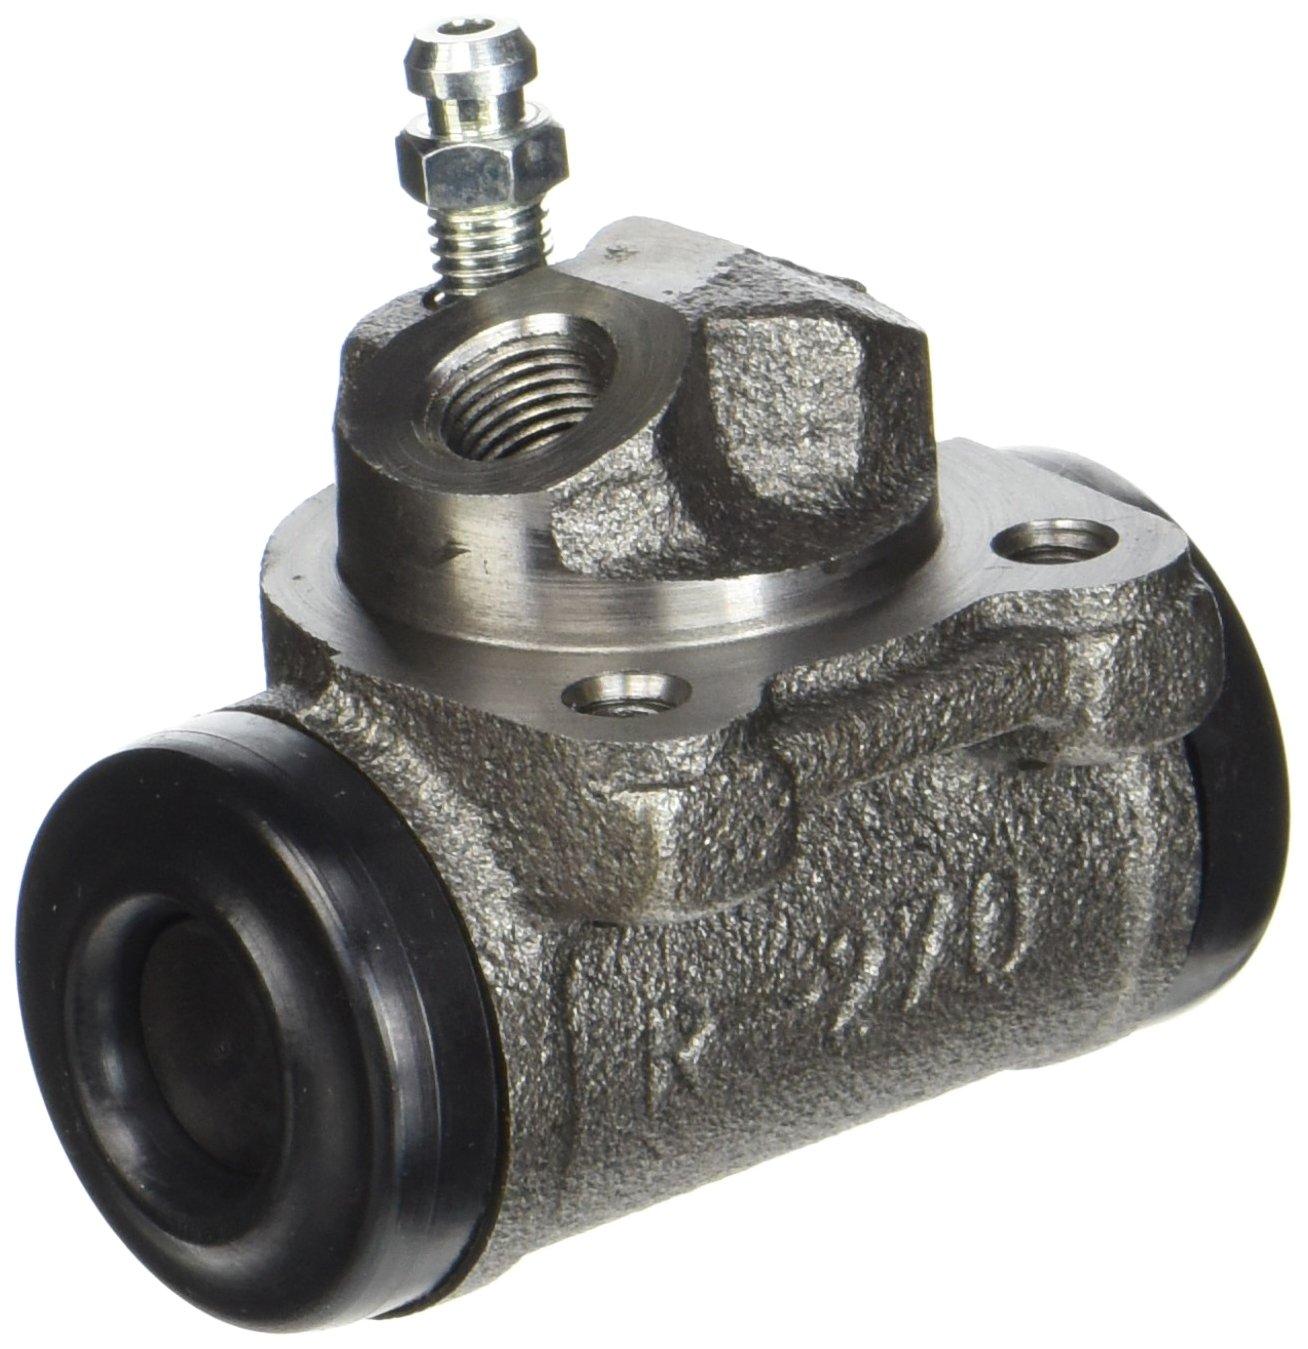 Ips Parts J ICR-4M00 Cilindretto Freno